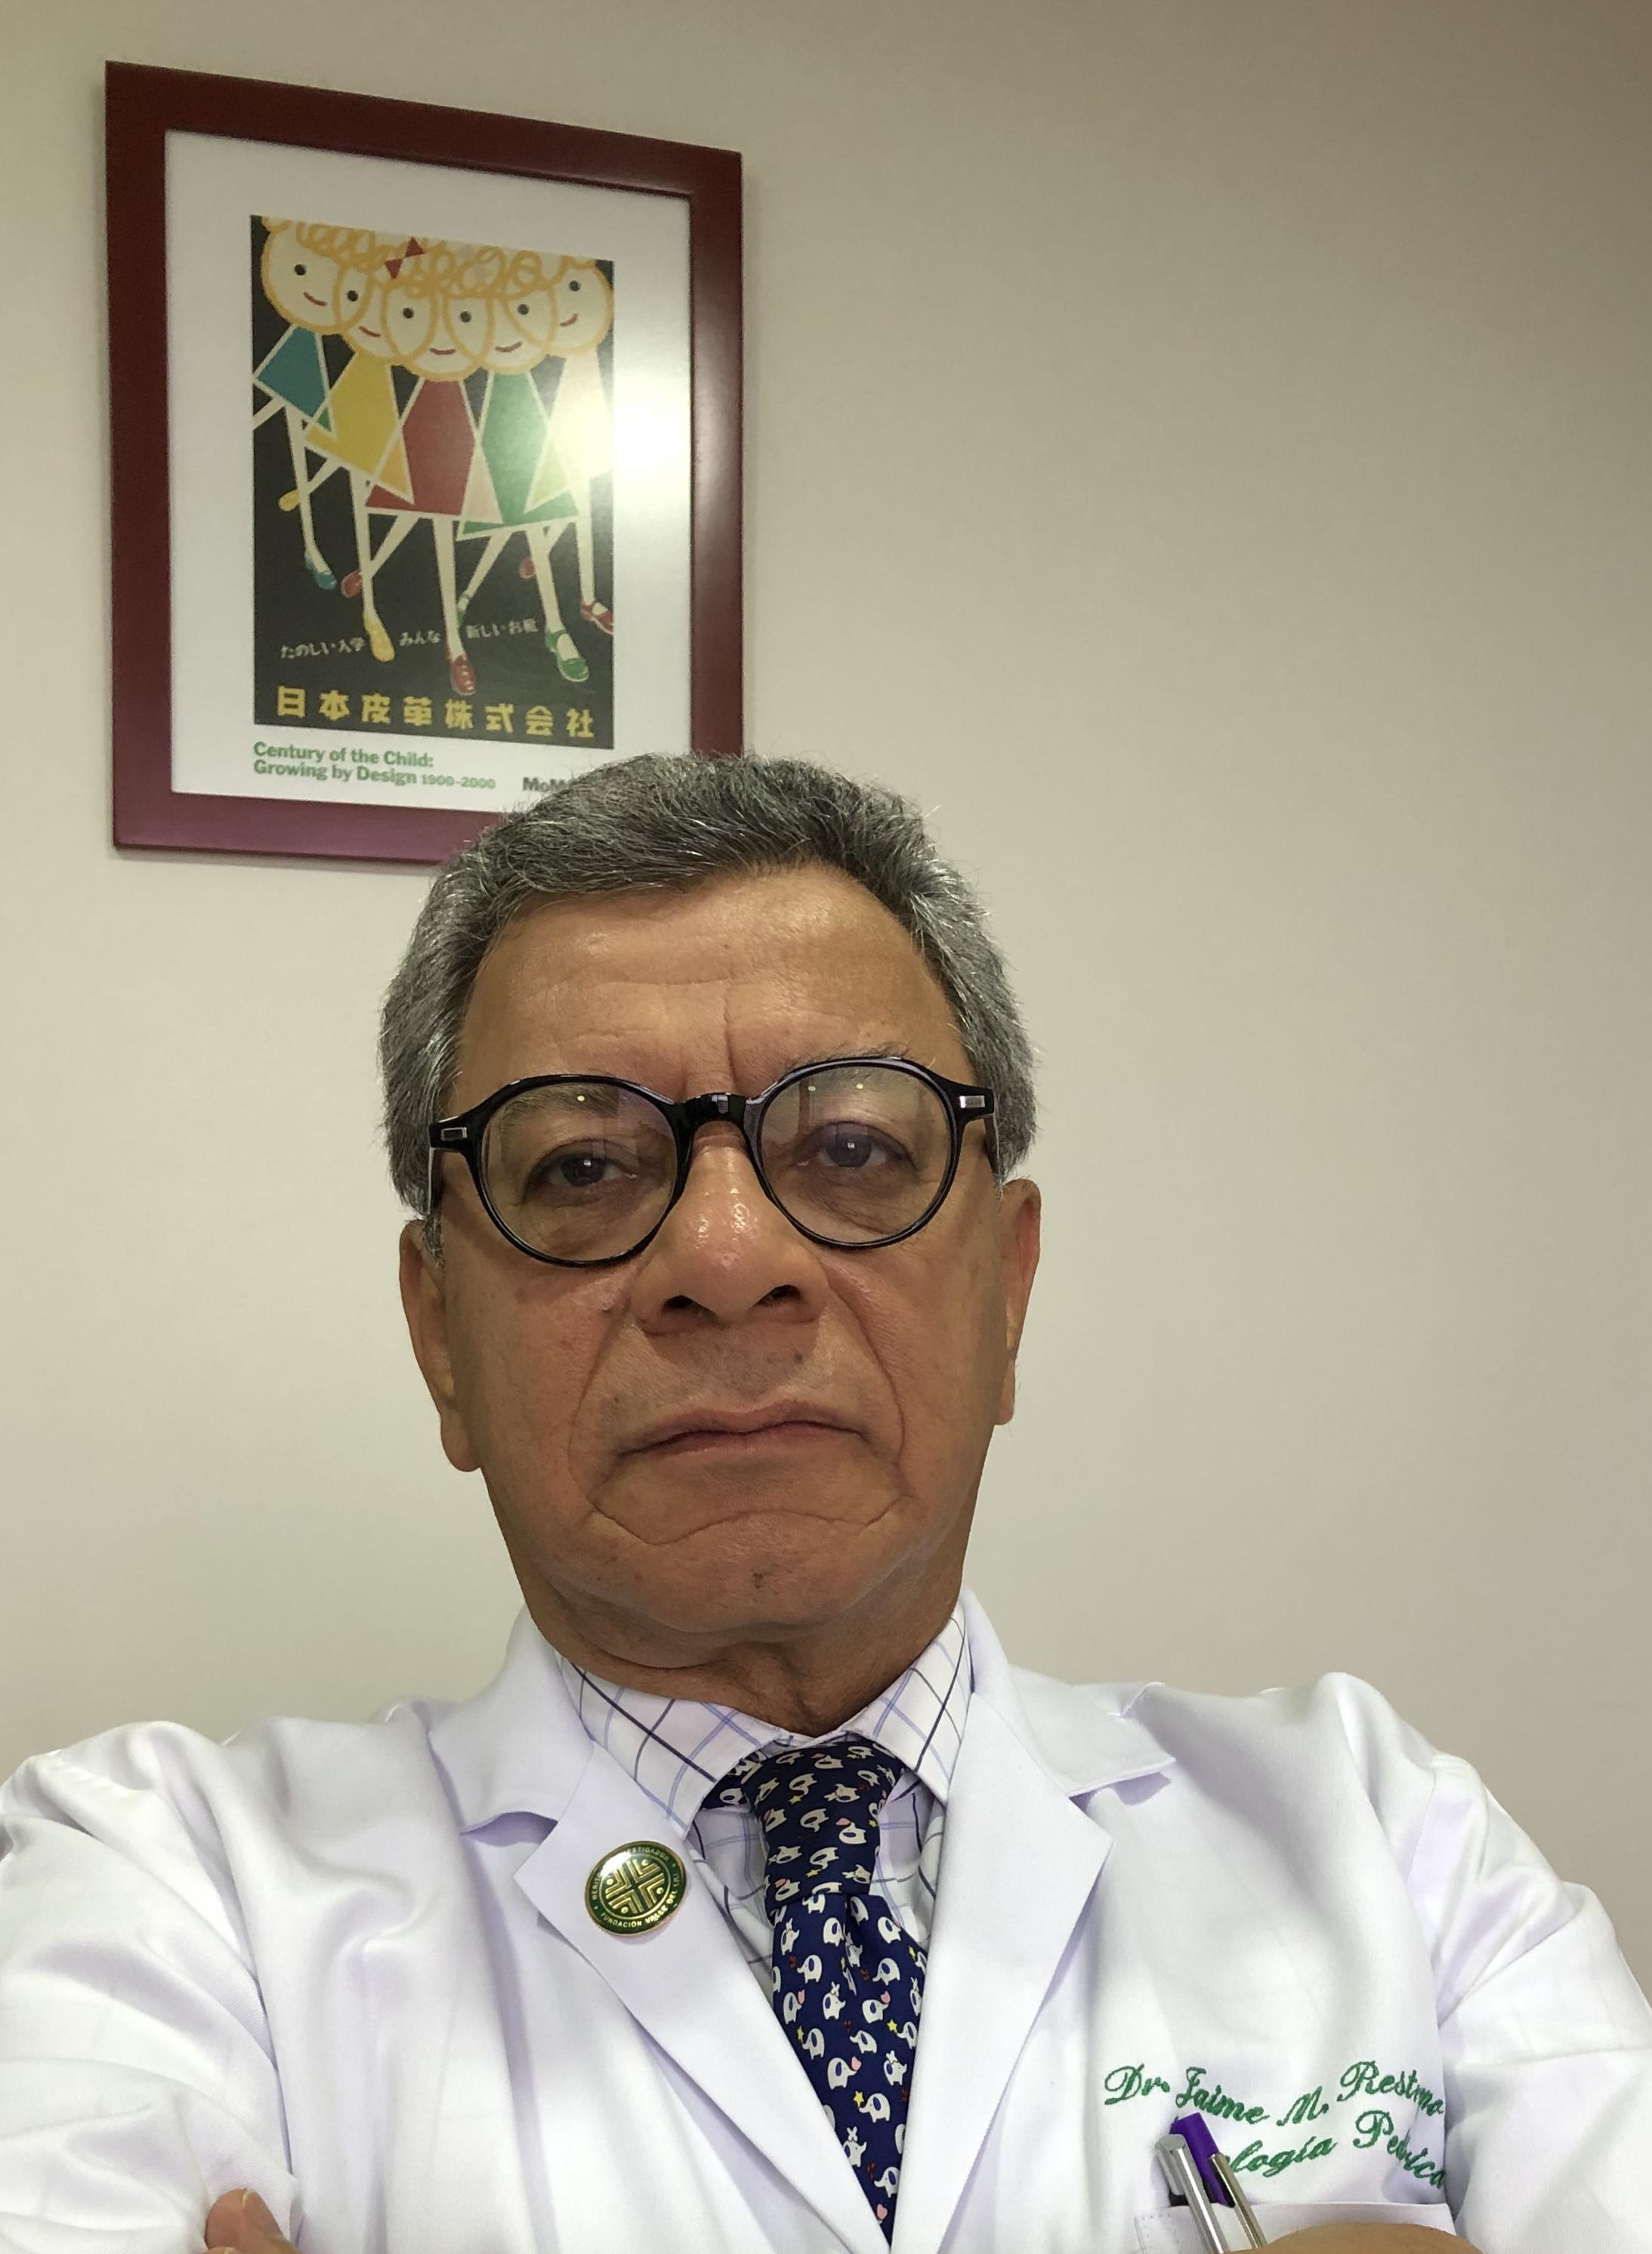 Jaime Restrepo